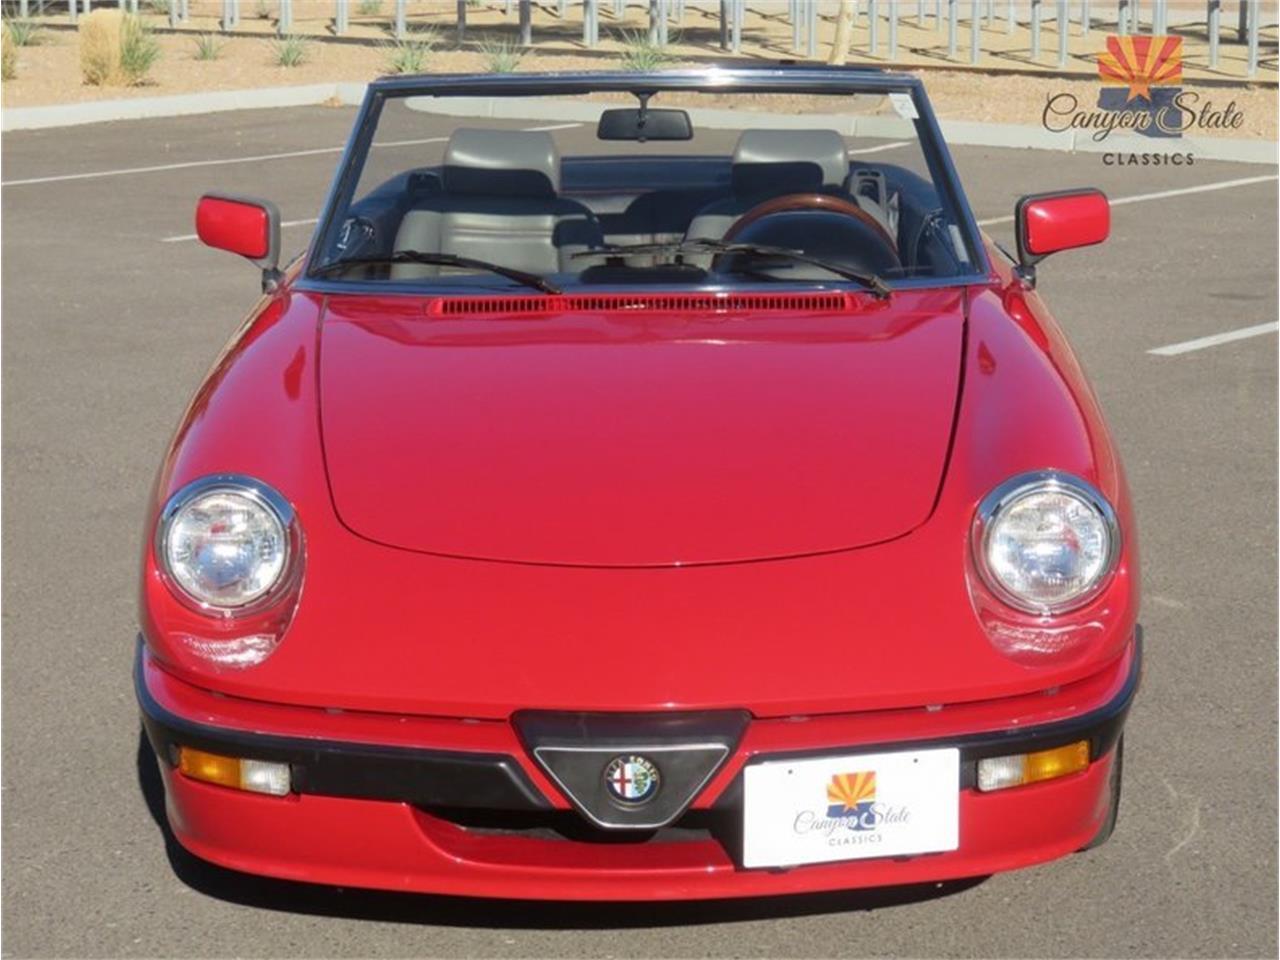 1989 Alfa Romeo Spider Quadrifolgio For Sale Cc Large Picture Of 89 Mn0t